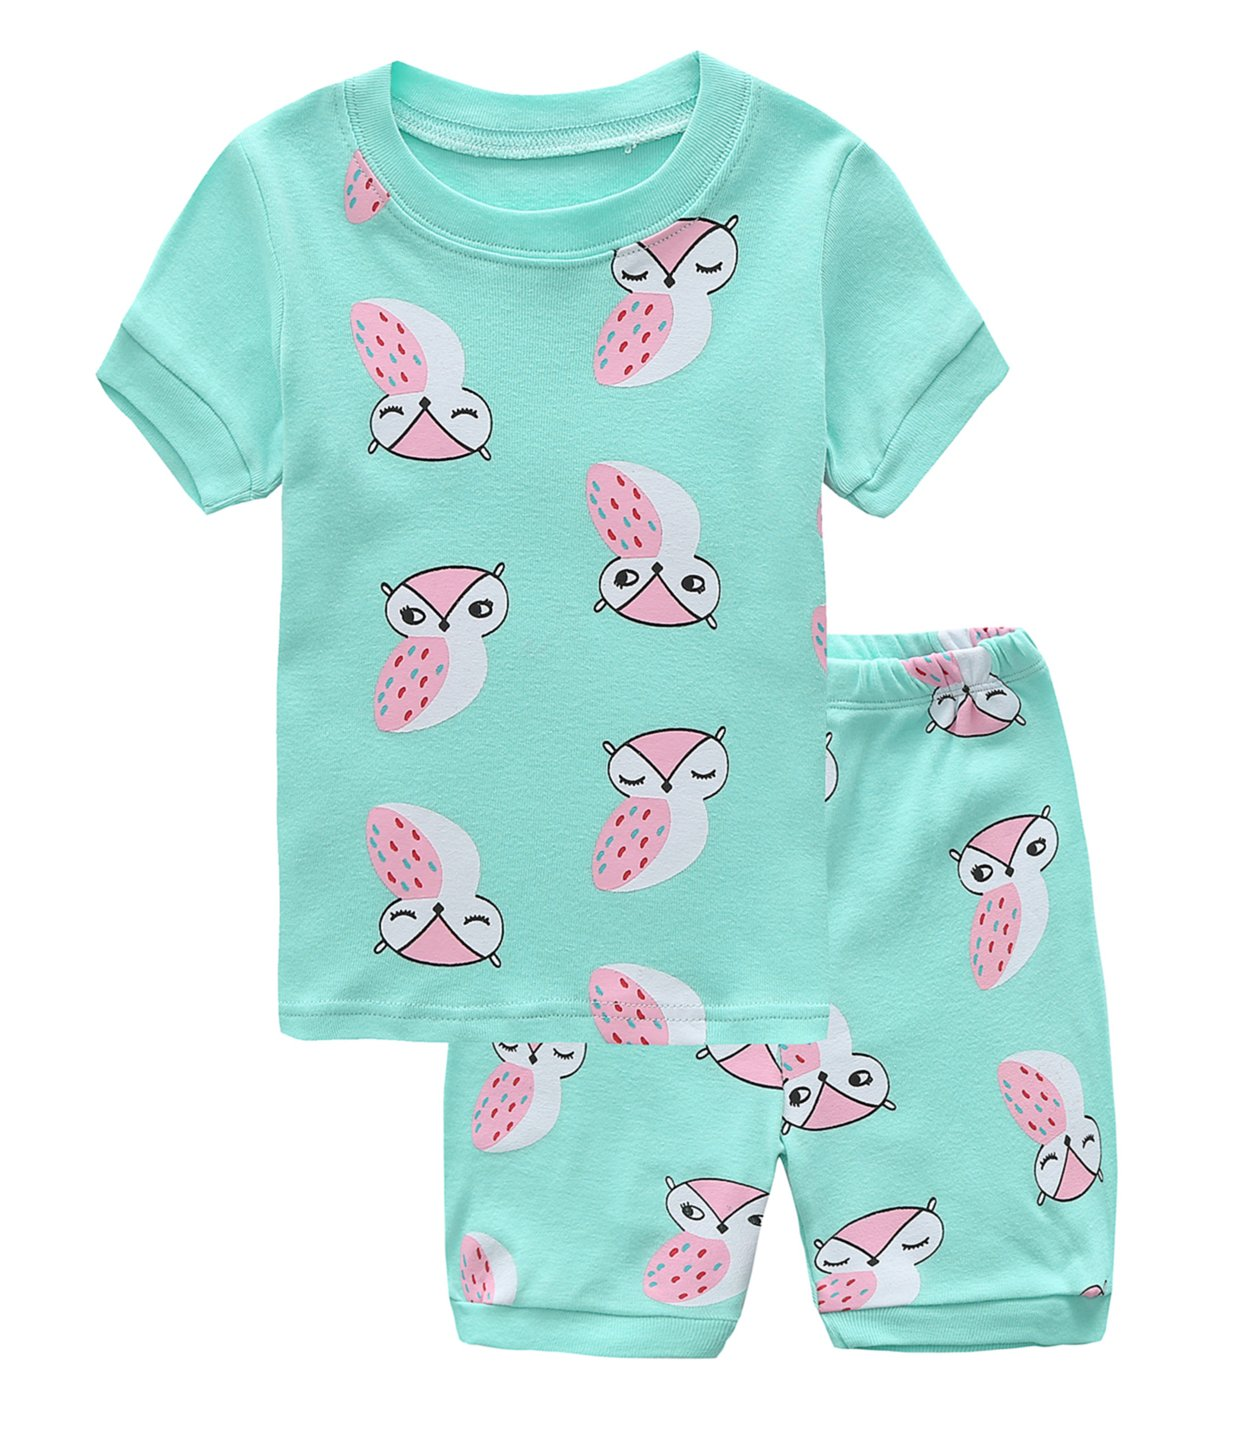 Fiream Girls Cotton Short Sleeves Pajamas Sets 2 Piece Cartoon Toddler Sleepwears(18015,3T/3-4YRS)